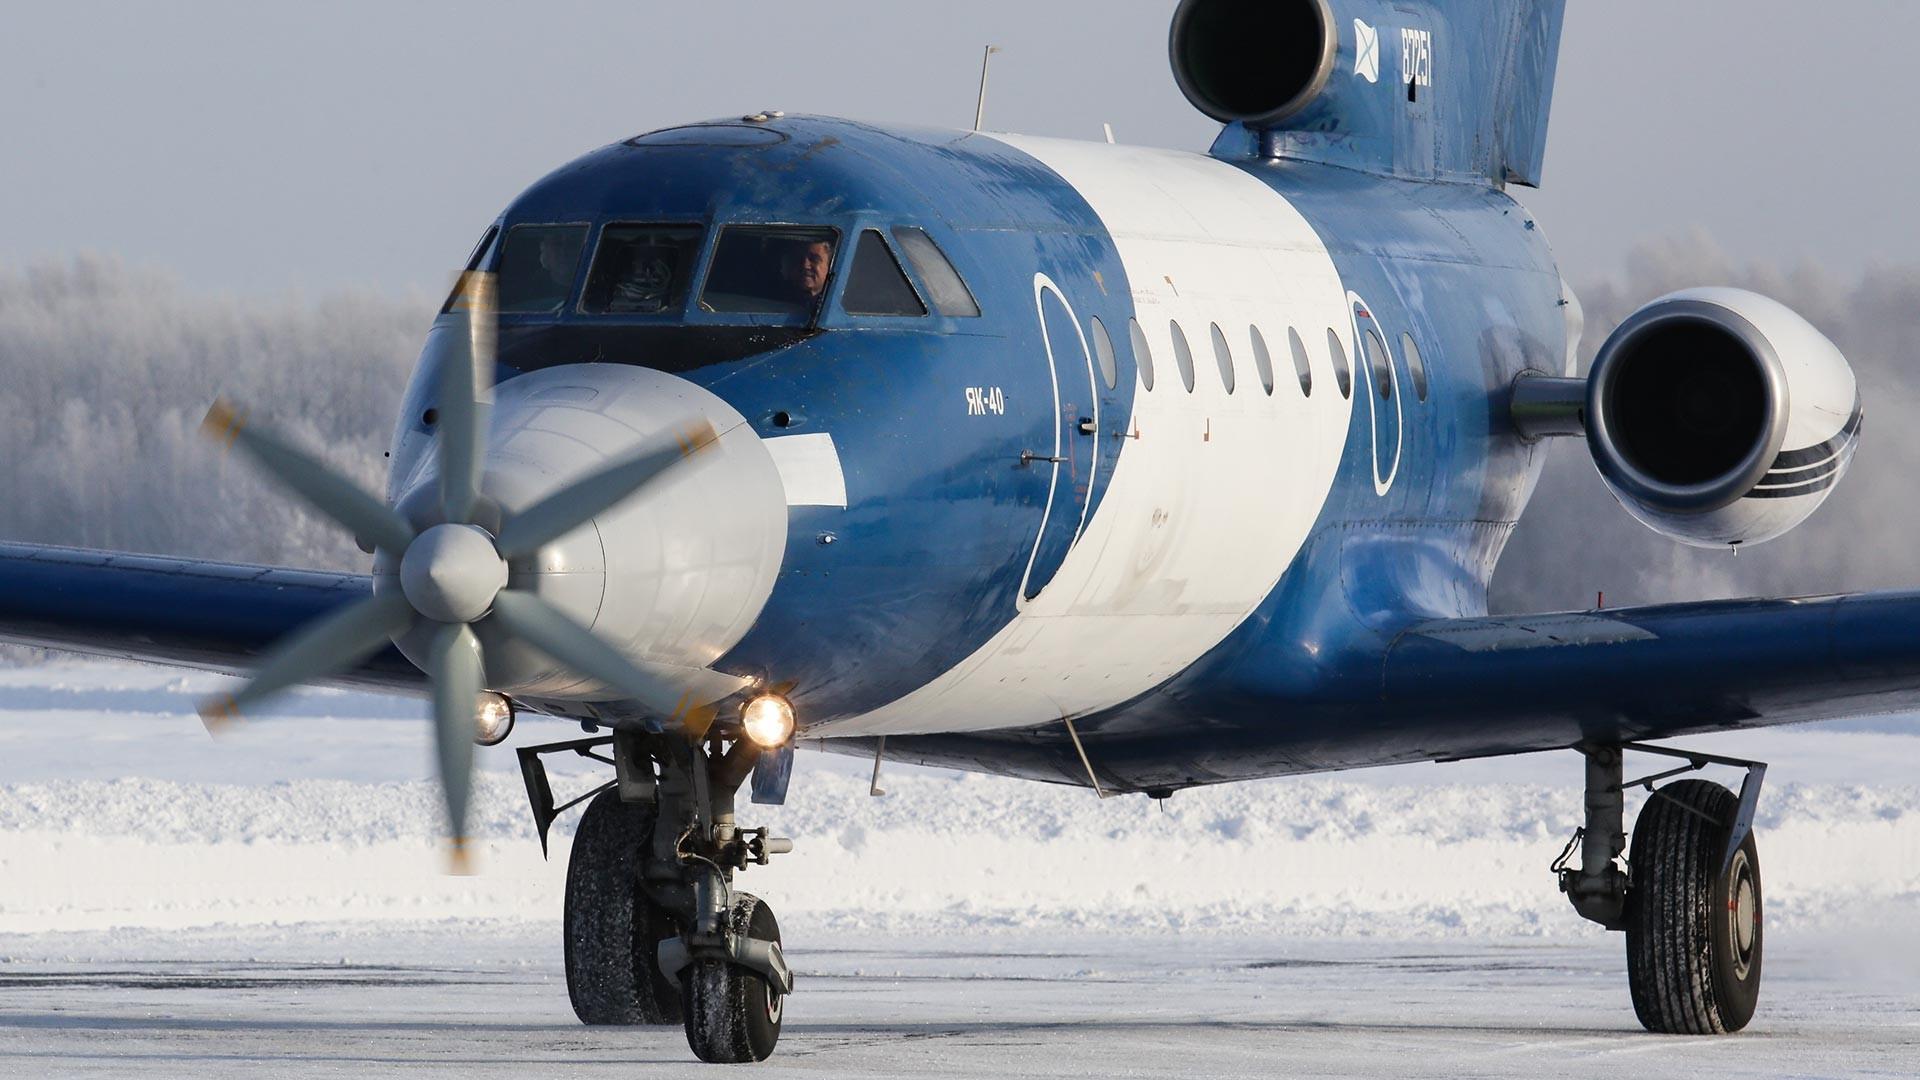 電気飛行機Yak-40の試験飛行